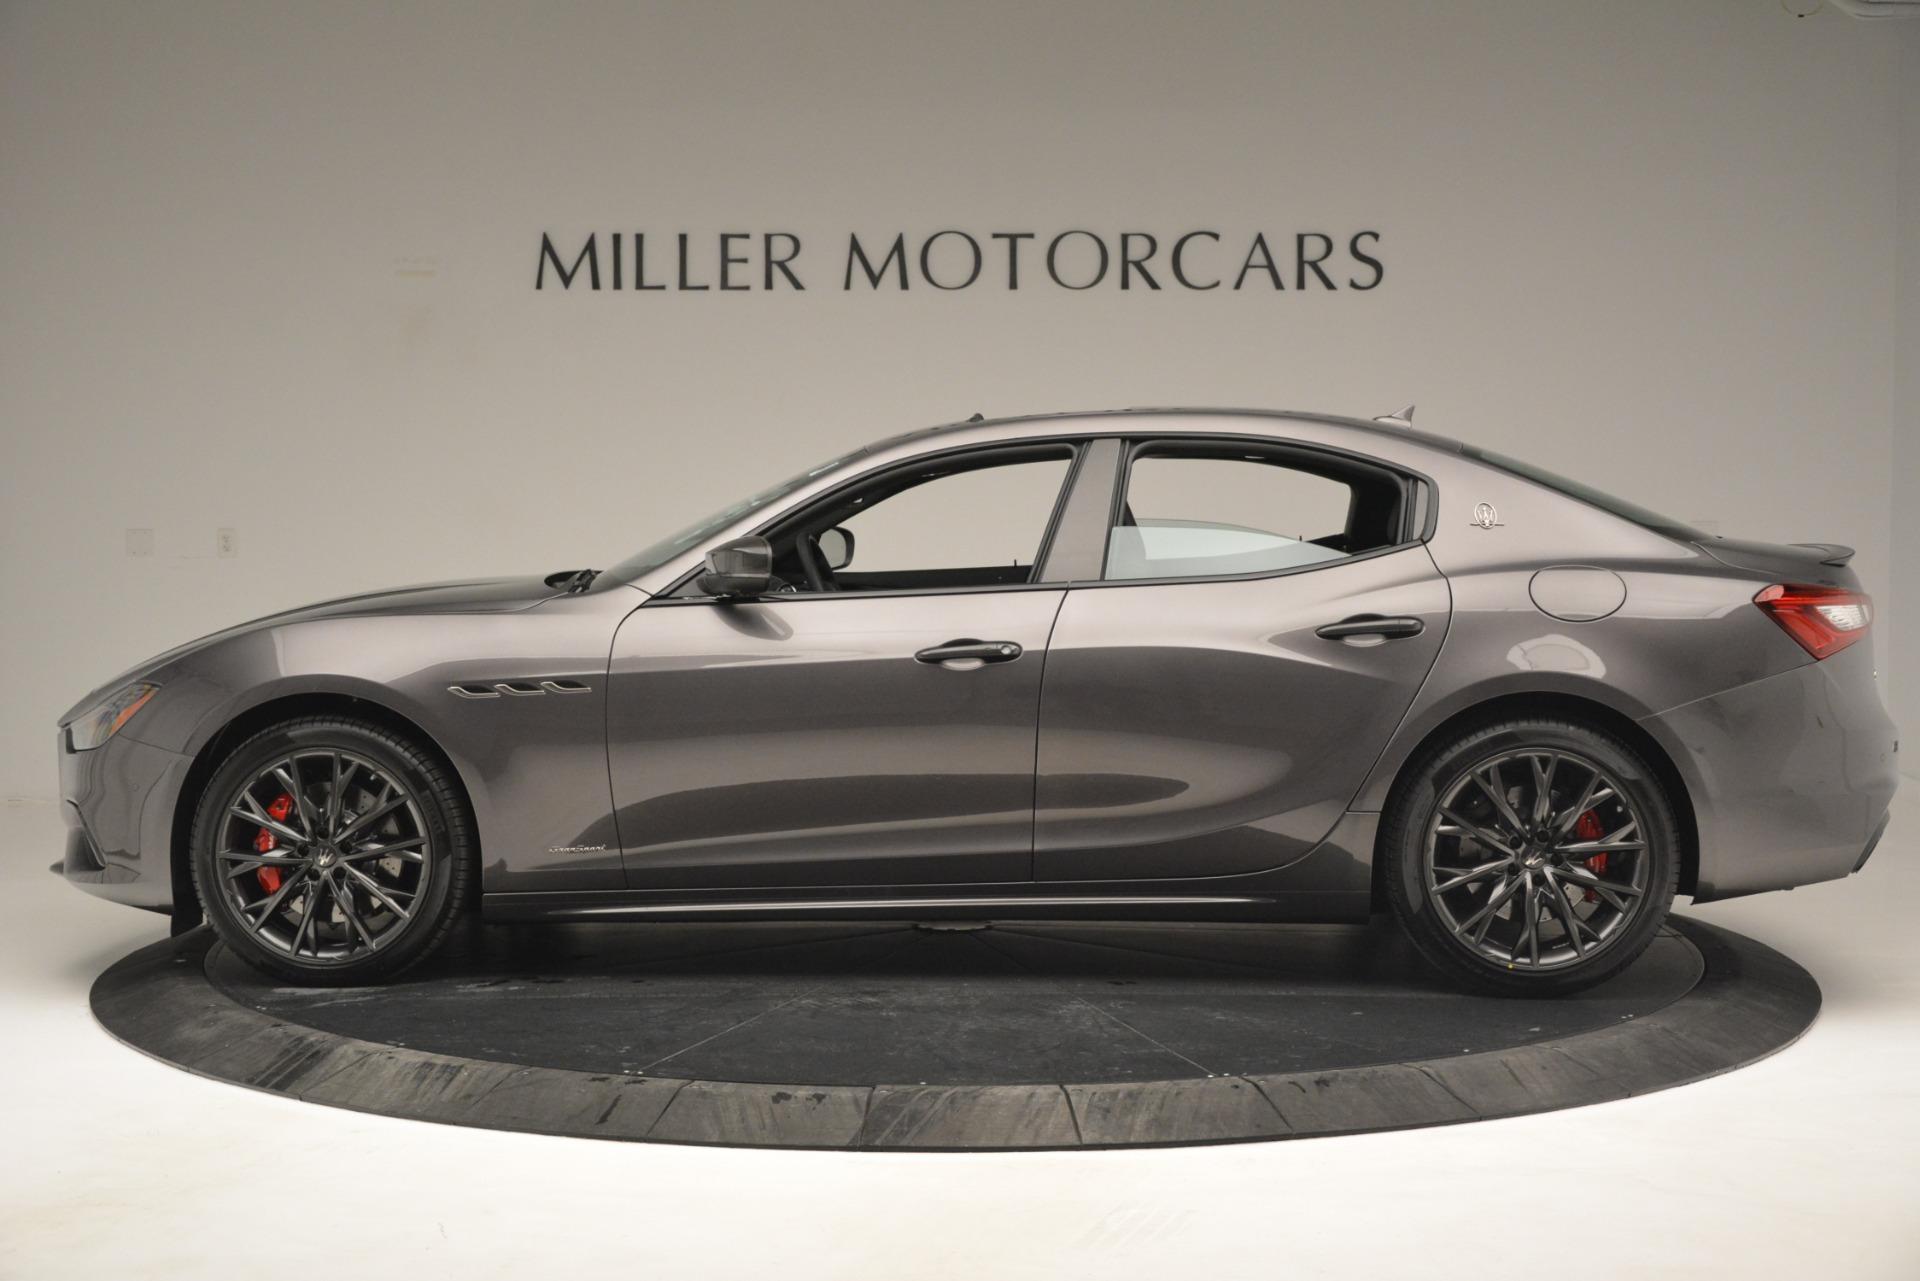 New 2019 Maserati Ghibli S Q4 GranSport For Sale In Greenwich, CT 2925_p4